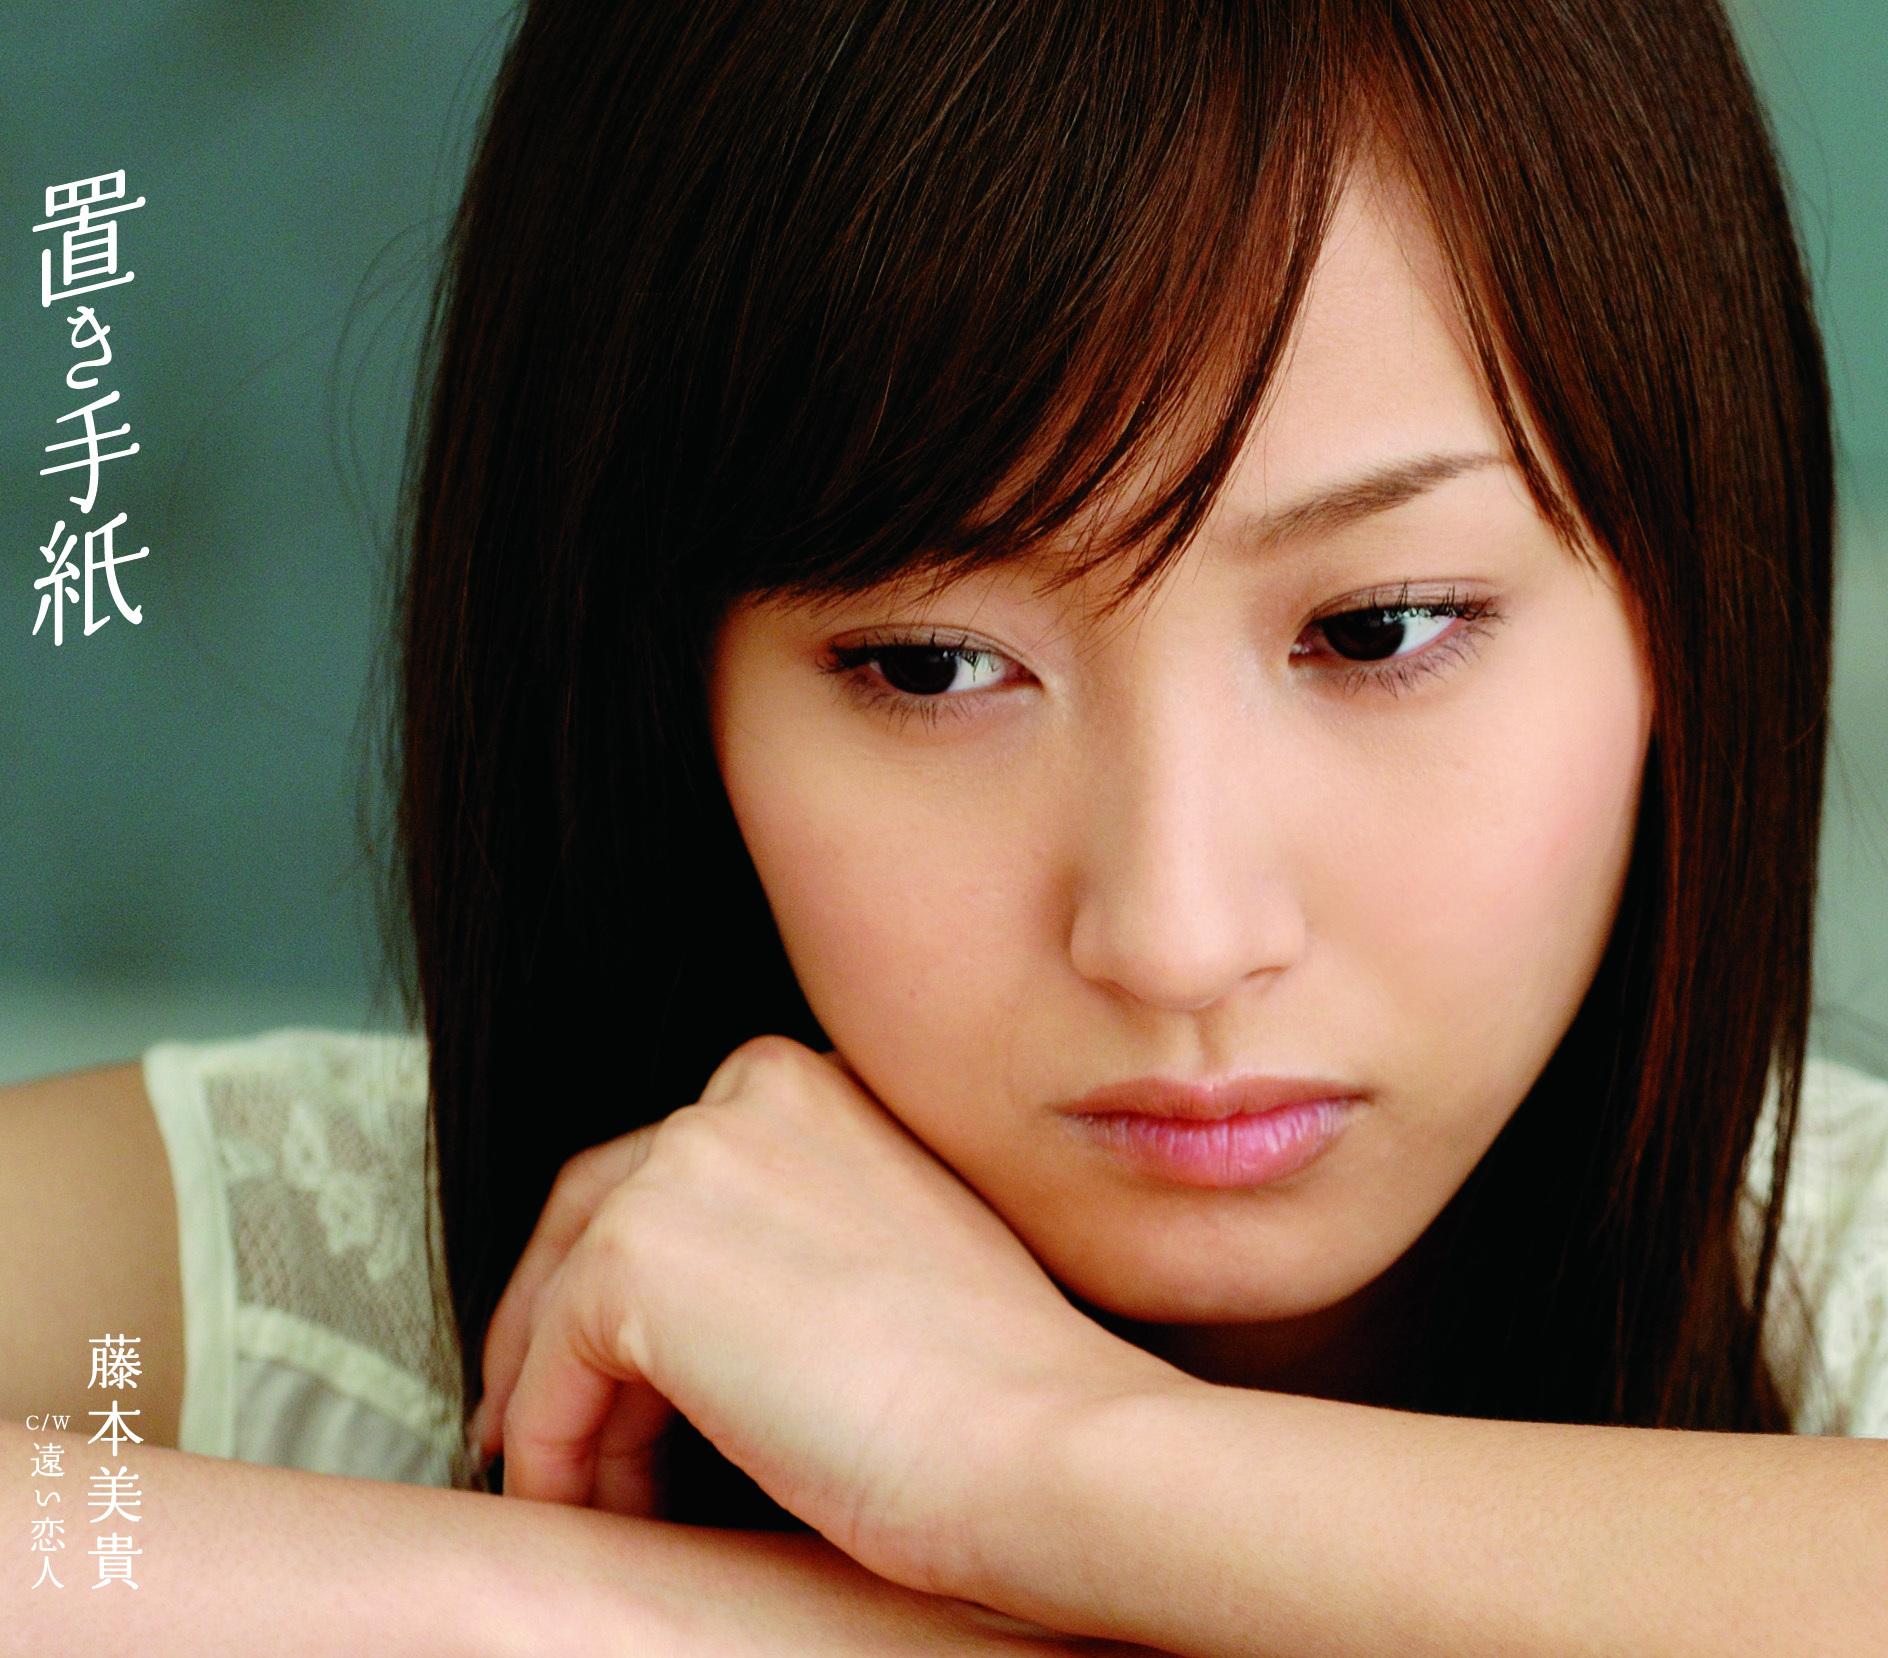 20171217.1035.07 Miki Fujimoto - Okitegami (FLAC) cover 1.jpg